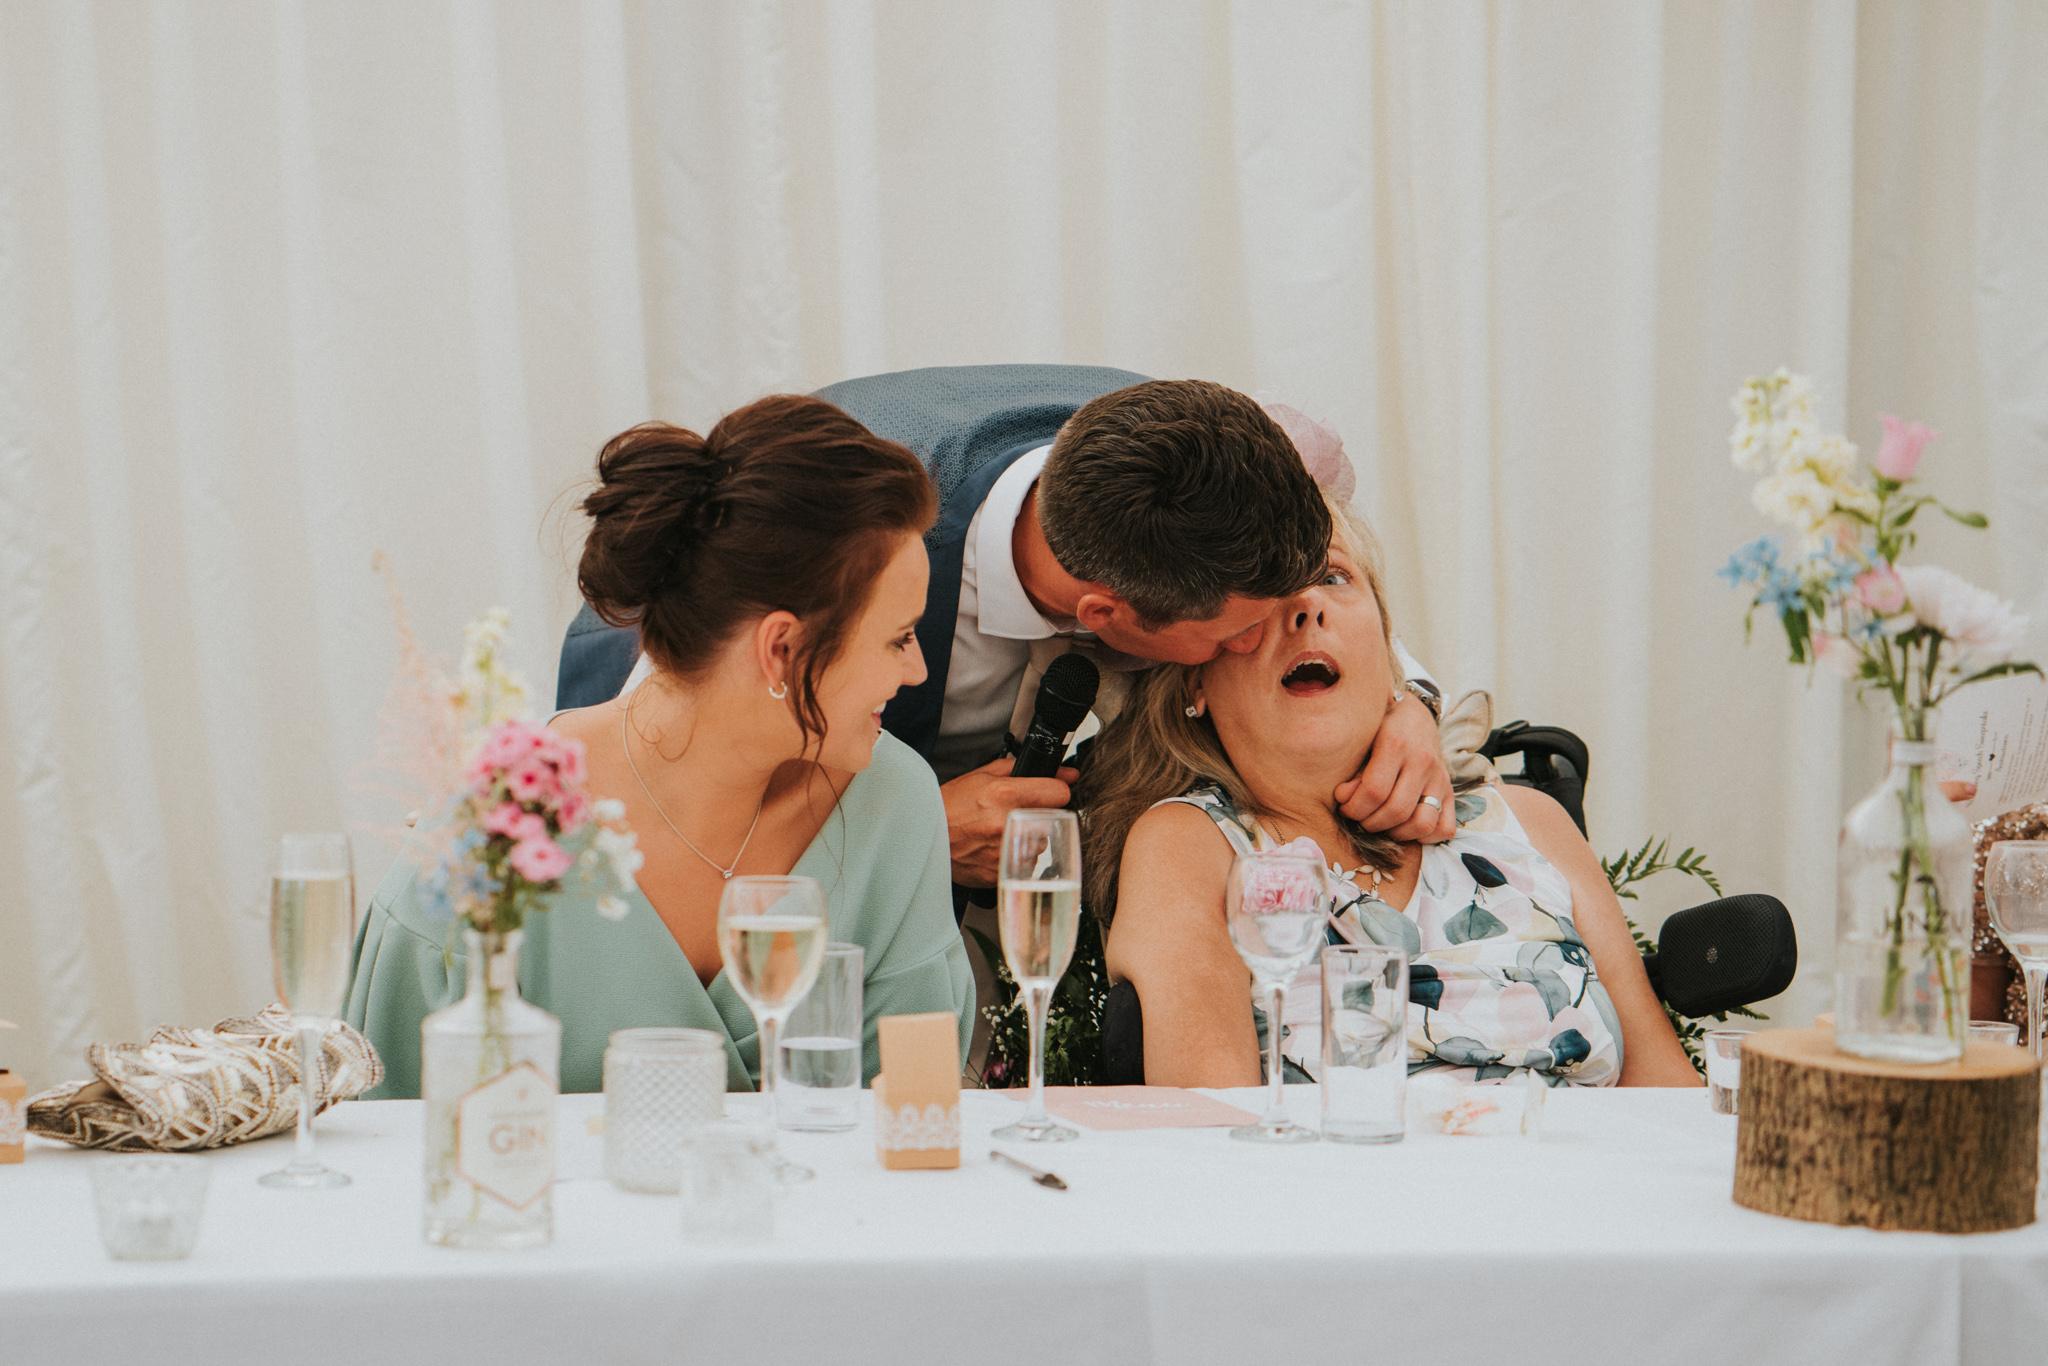 danielle-and-gareths-boho-wedding-previews-at-high-house-weddings-grace-elizabeth-colchester-essex-suffolk-norfolk-devon-alternative-wedding-and-lifestyle-photographer (60 of 76).jpg